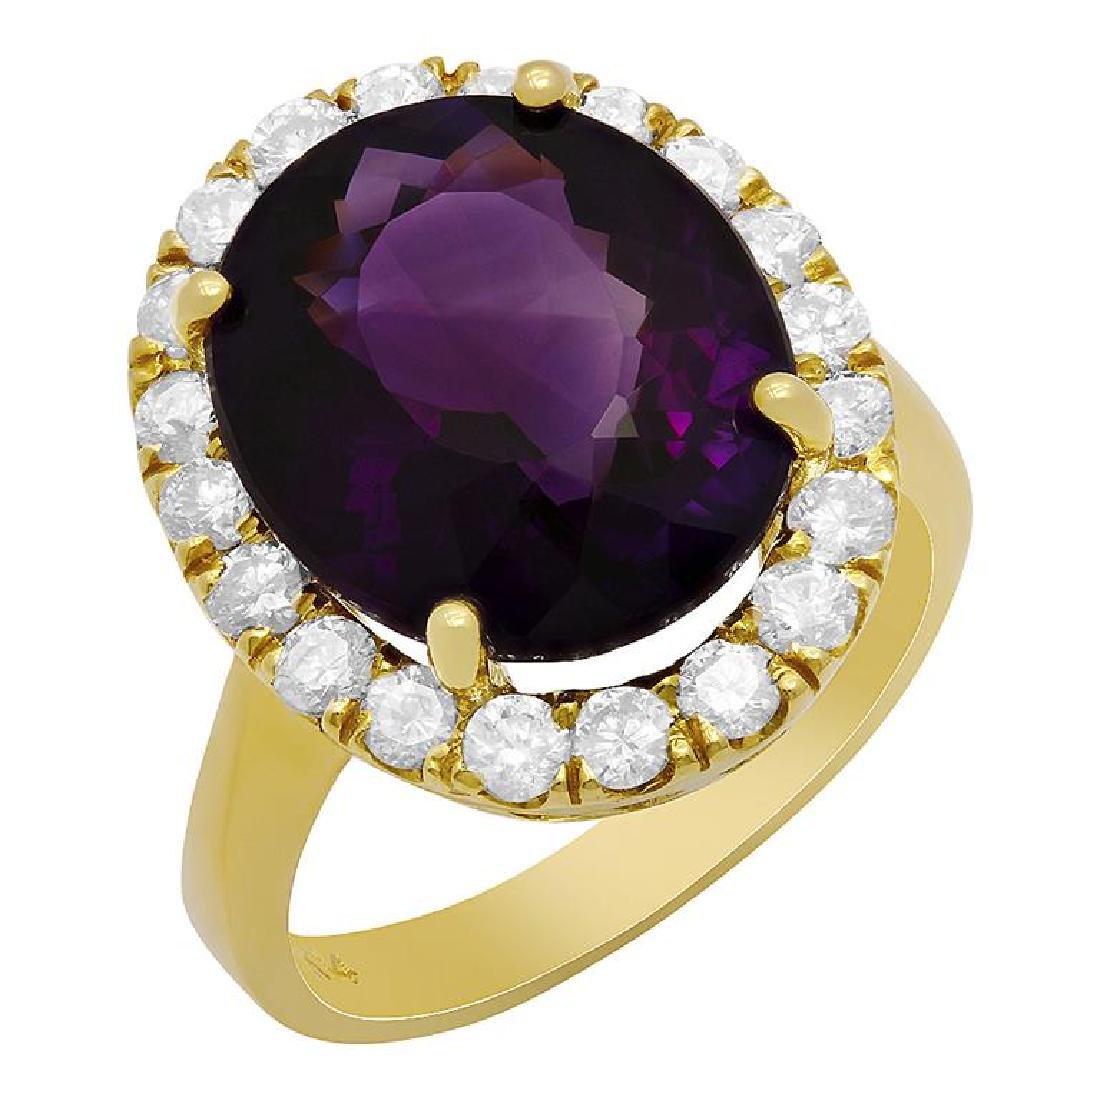 14k Yellow Gold 7.20ct Amethyst 1.09ct Diamond Ring